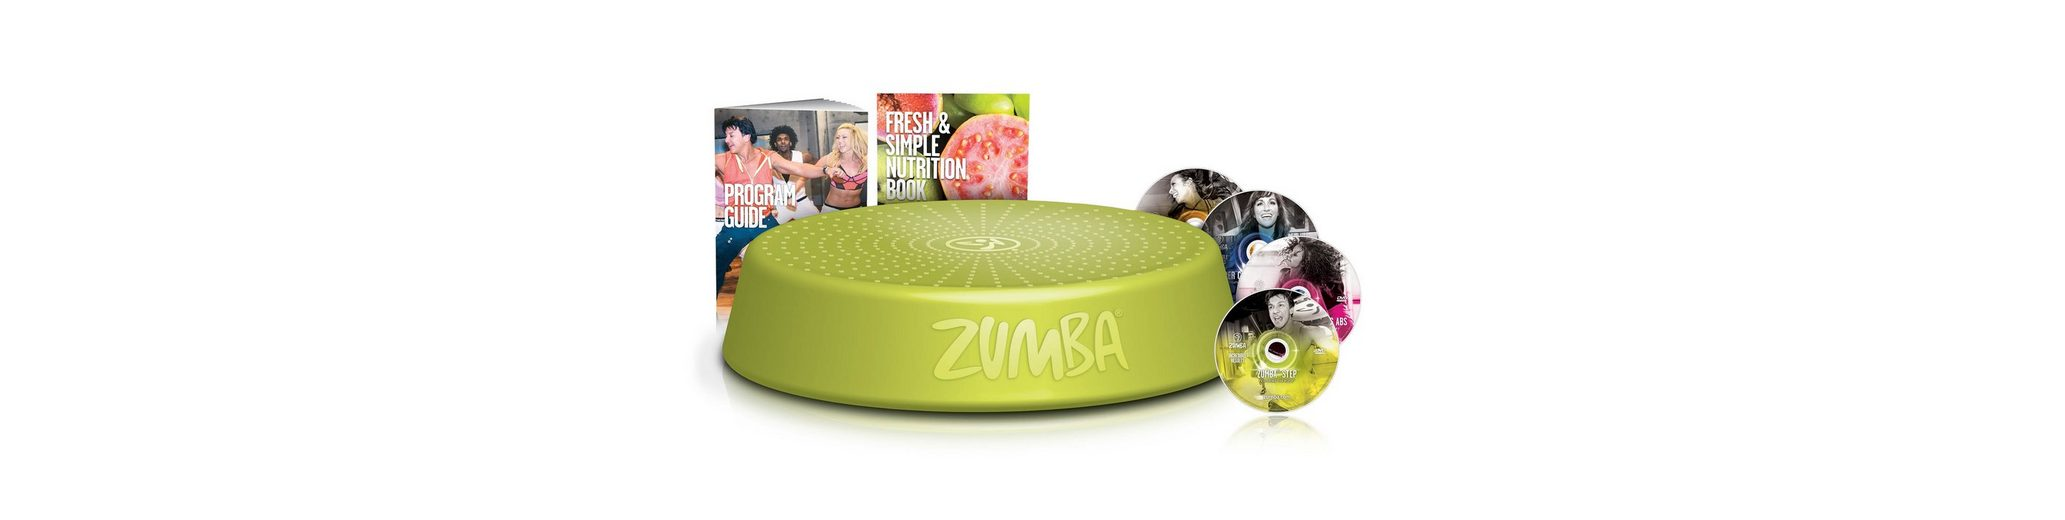 Trainingspaket, ZUMBA® Incredible Results Kit™